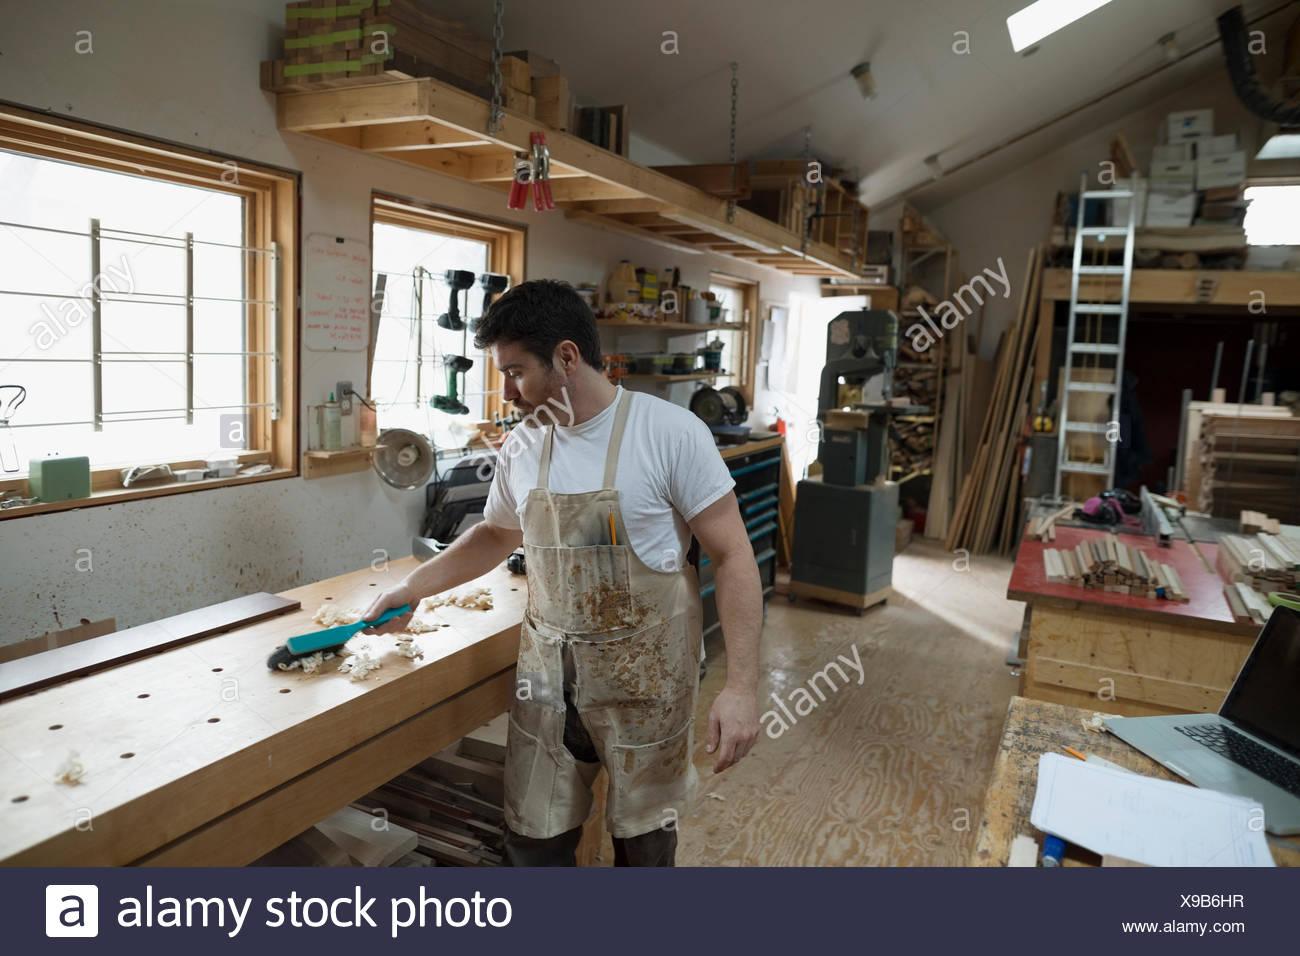 Carpenter working in workshop - Stock Image